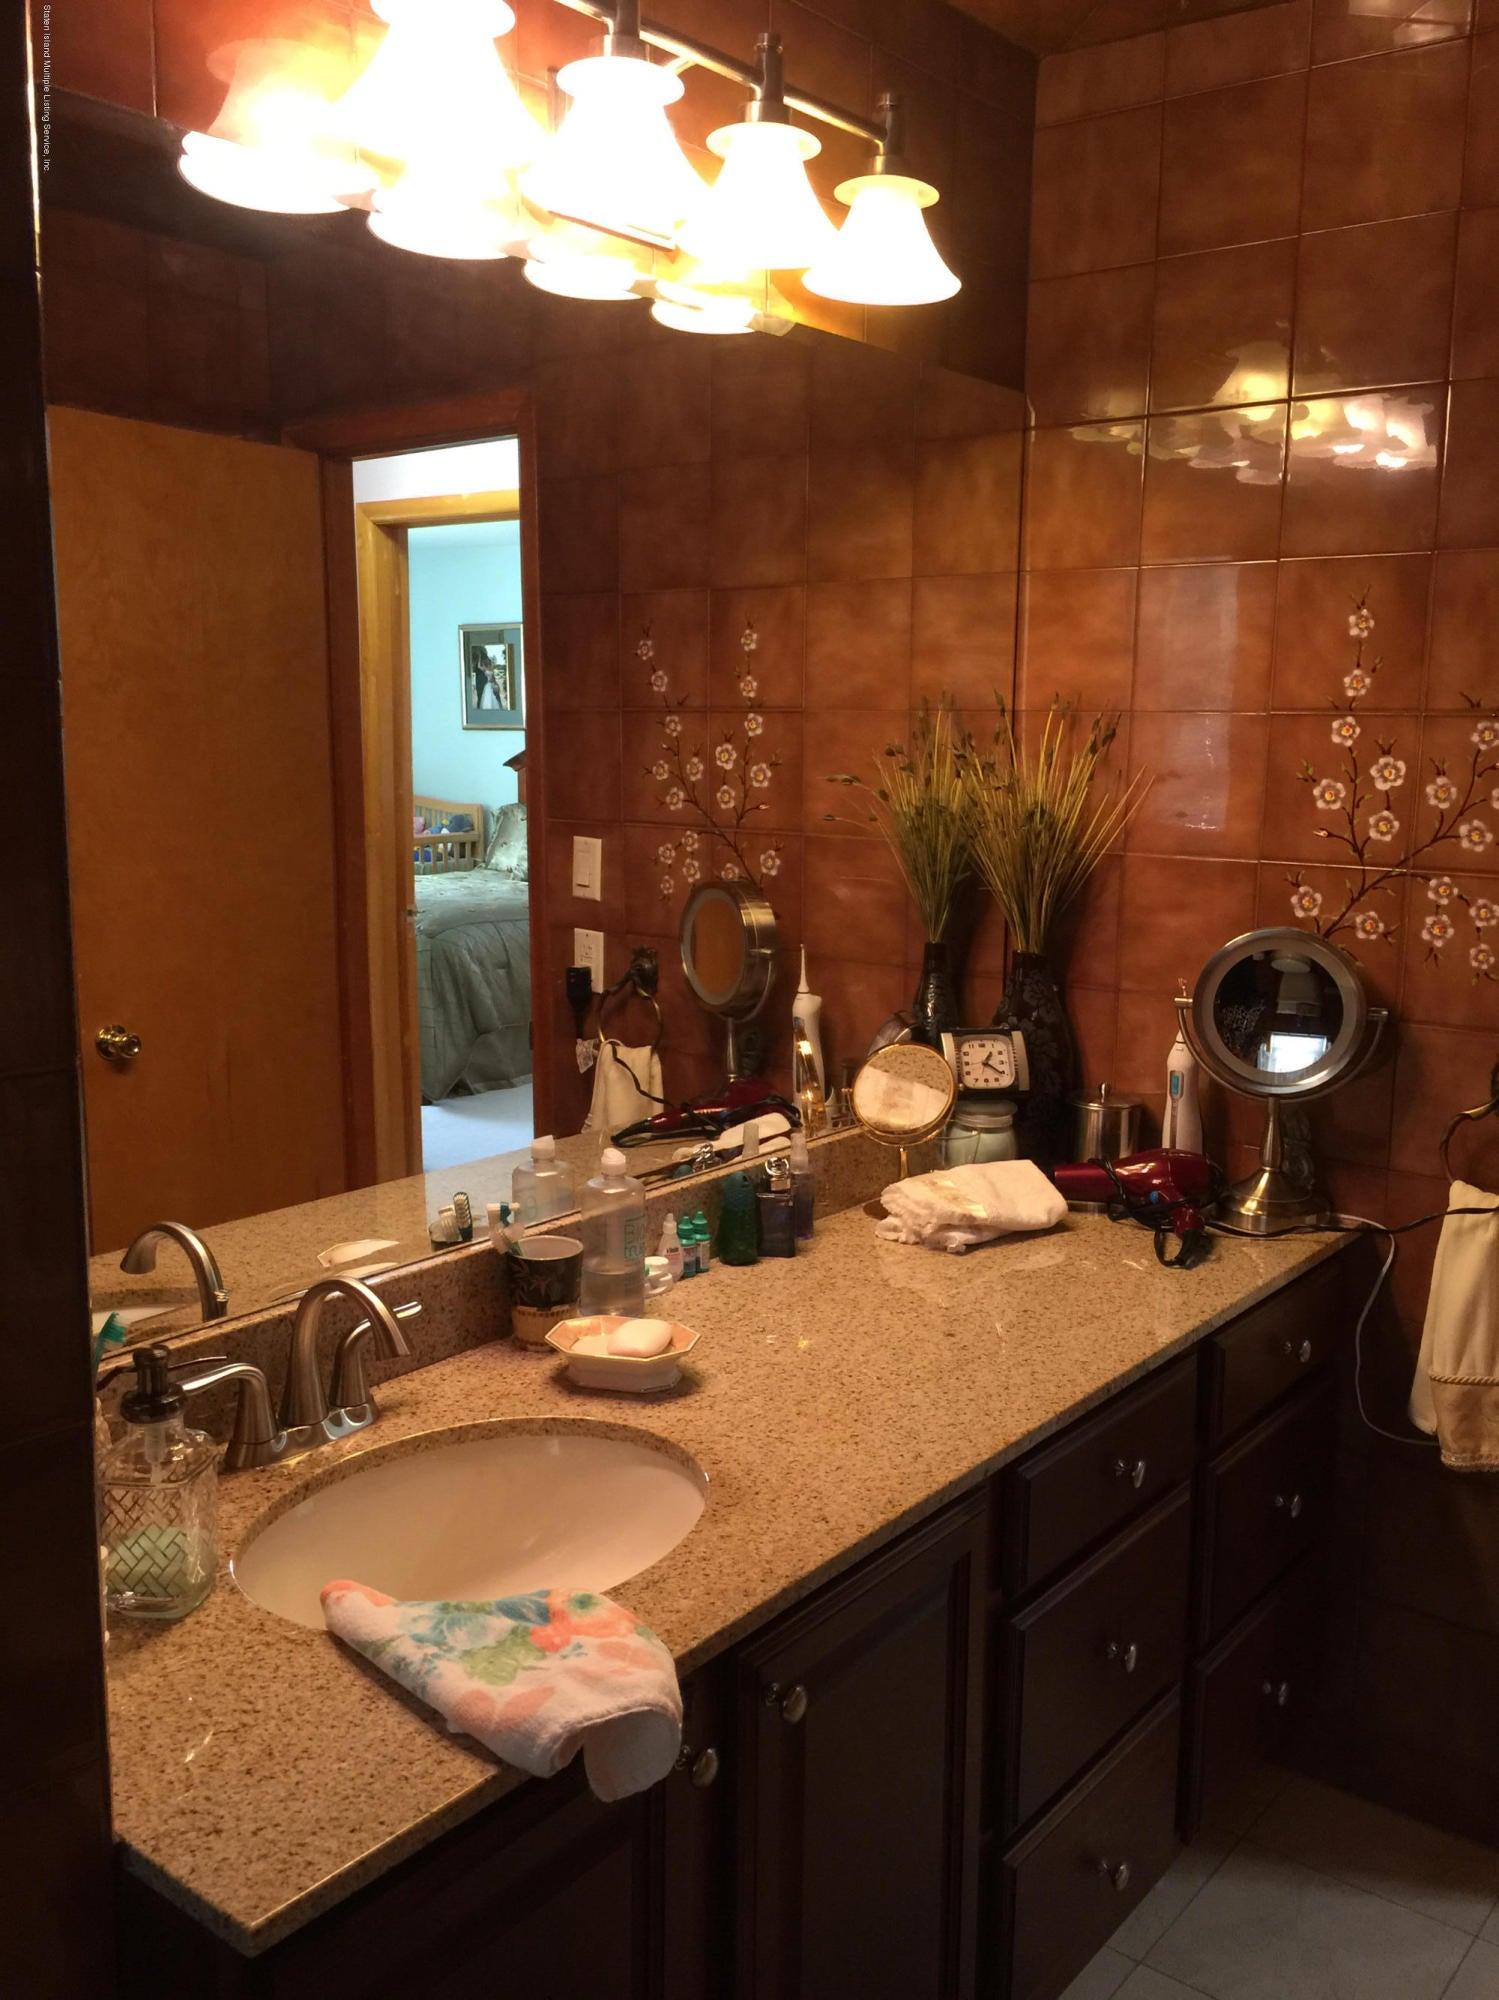 Single Family - Detached 108 Clarke Avenue  Staten Island, NY 10306, MLS-1106455-23